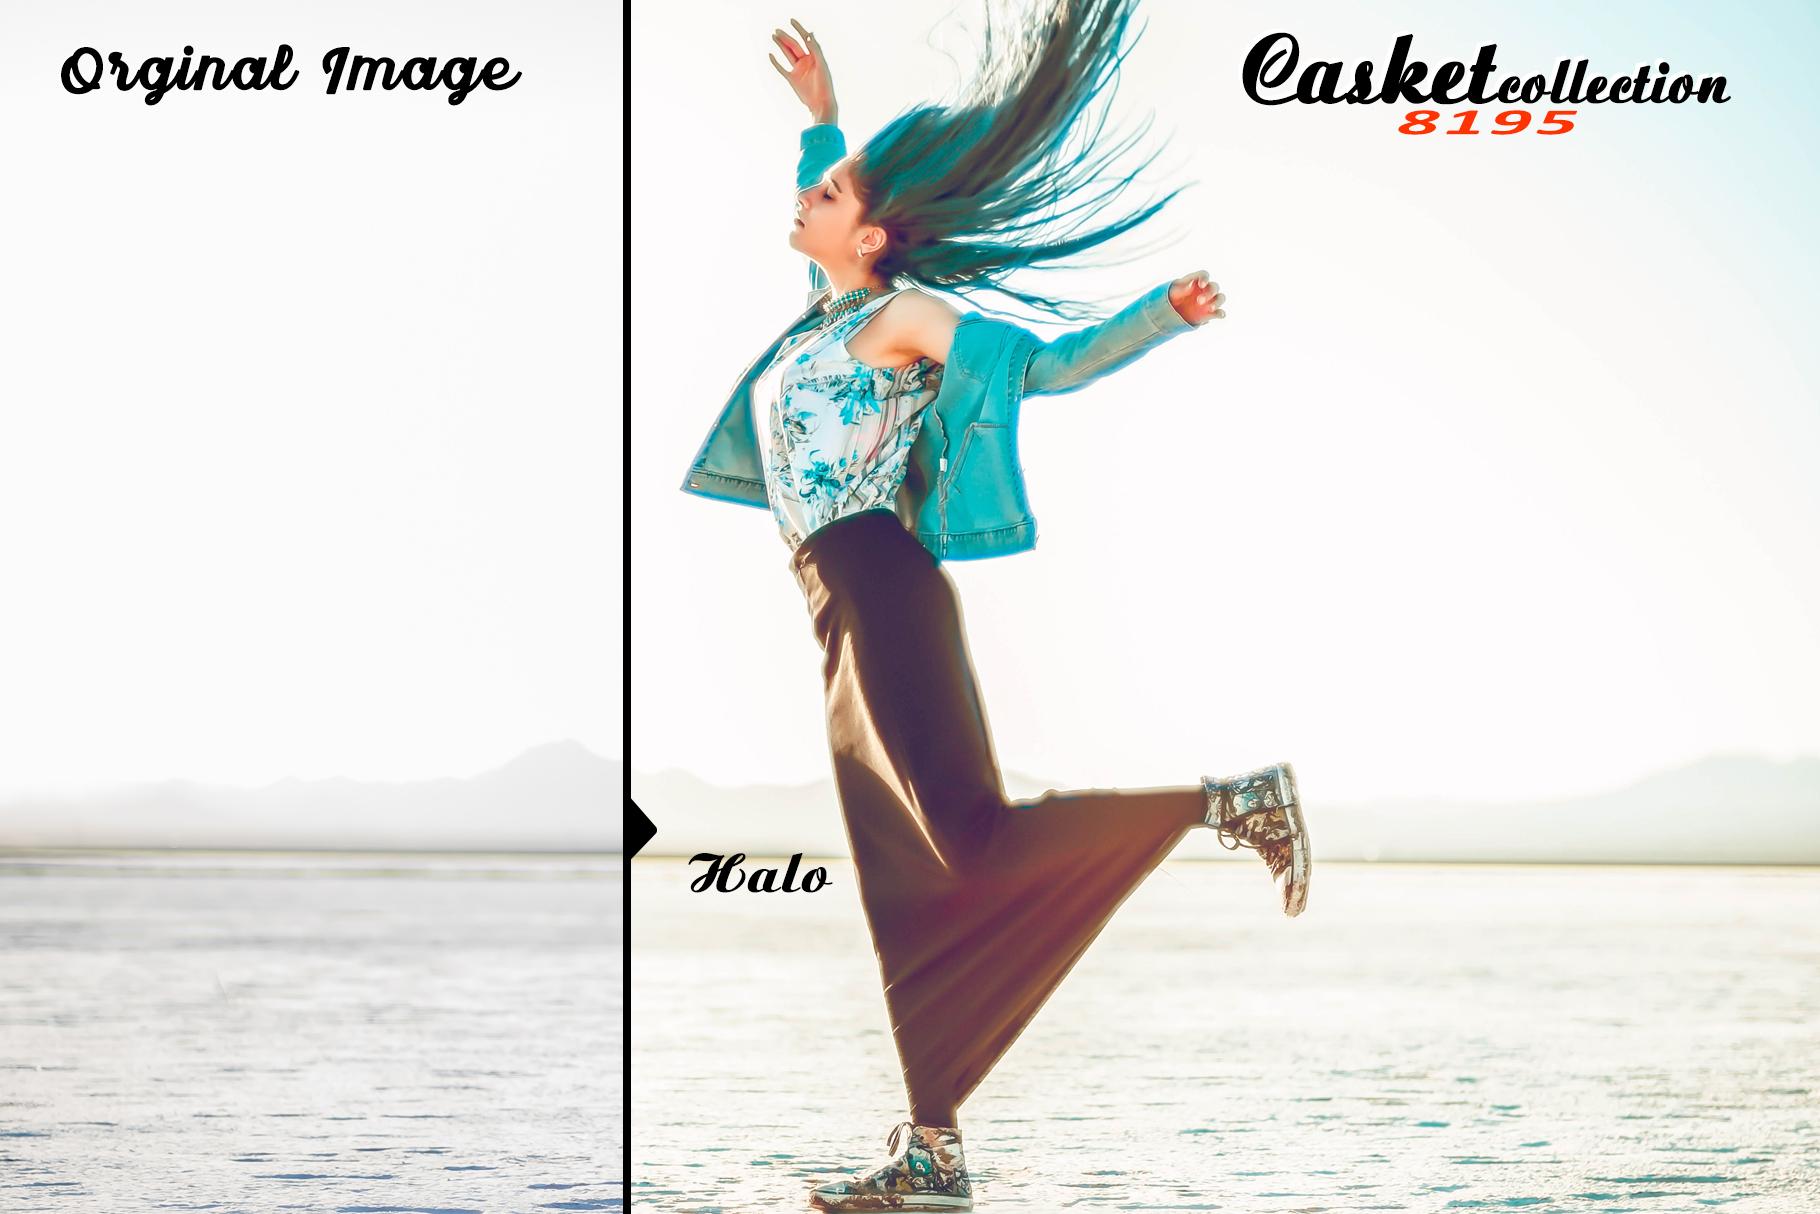 Casket Collection Lightroom Presets example image 12